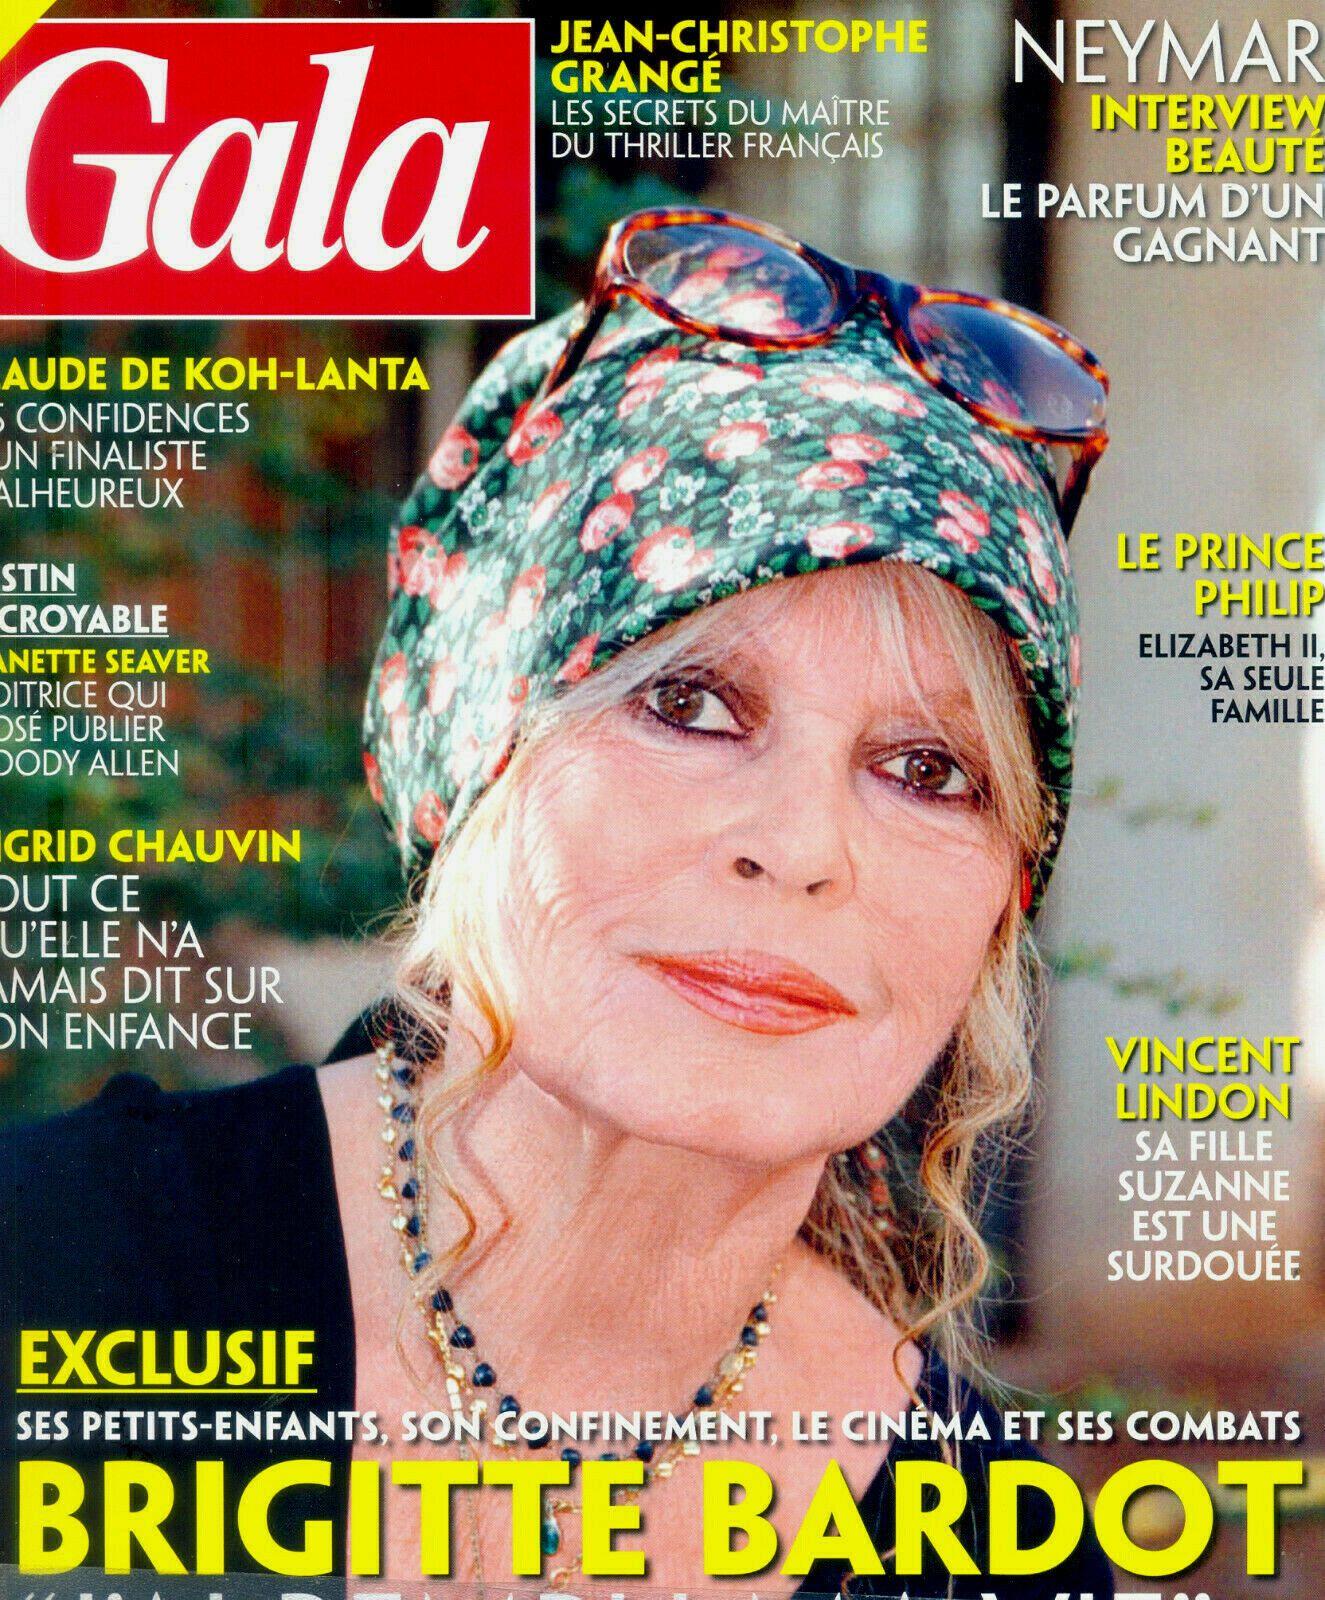 Brigitte Bardot en couverture de Gala!